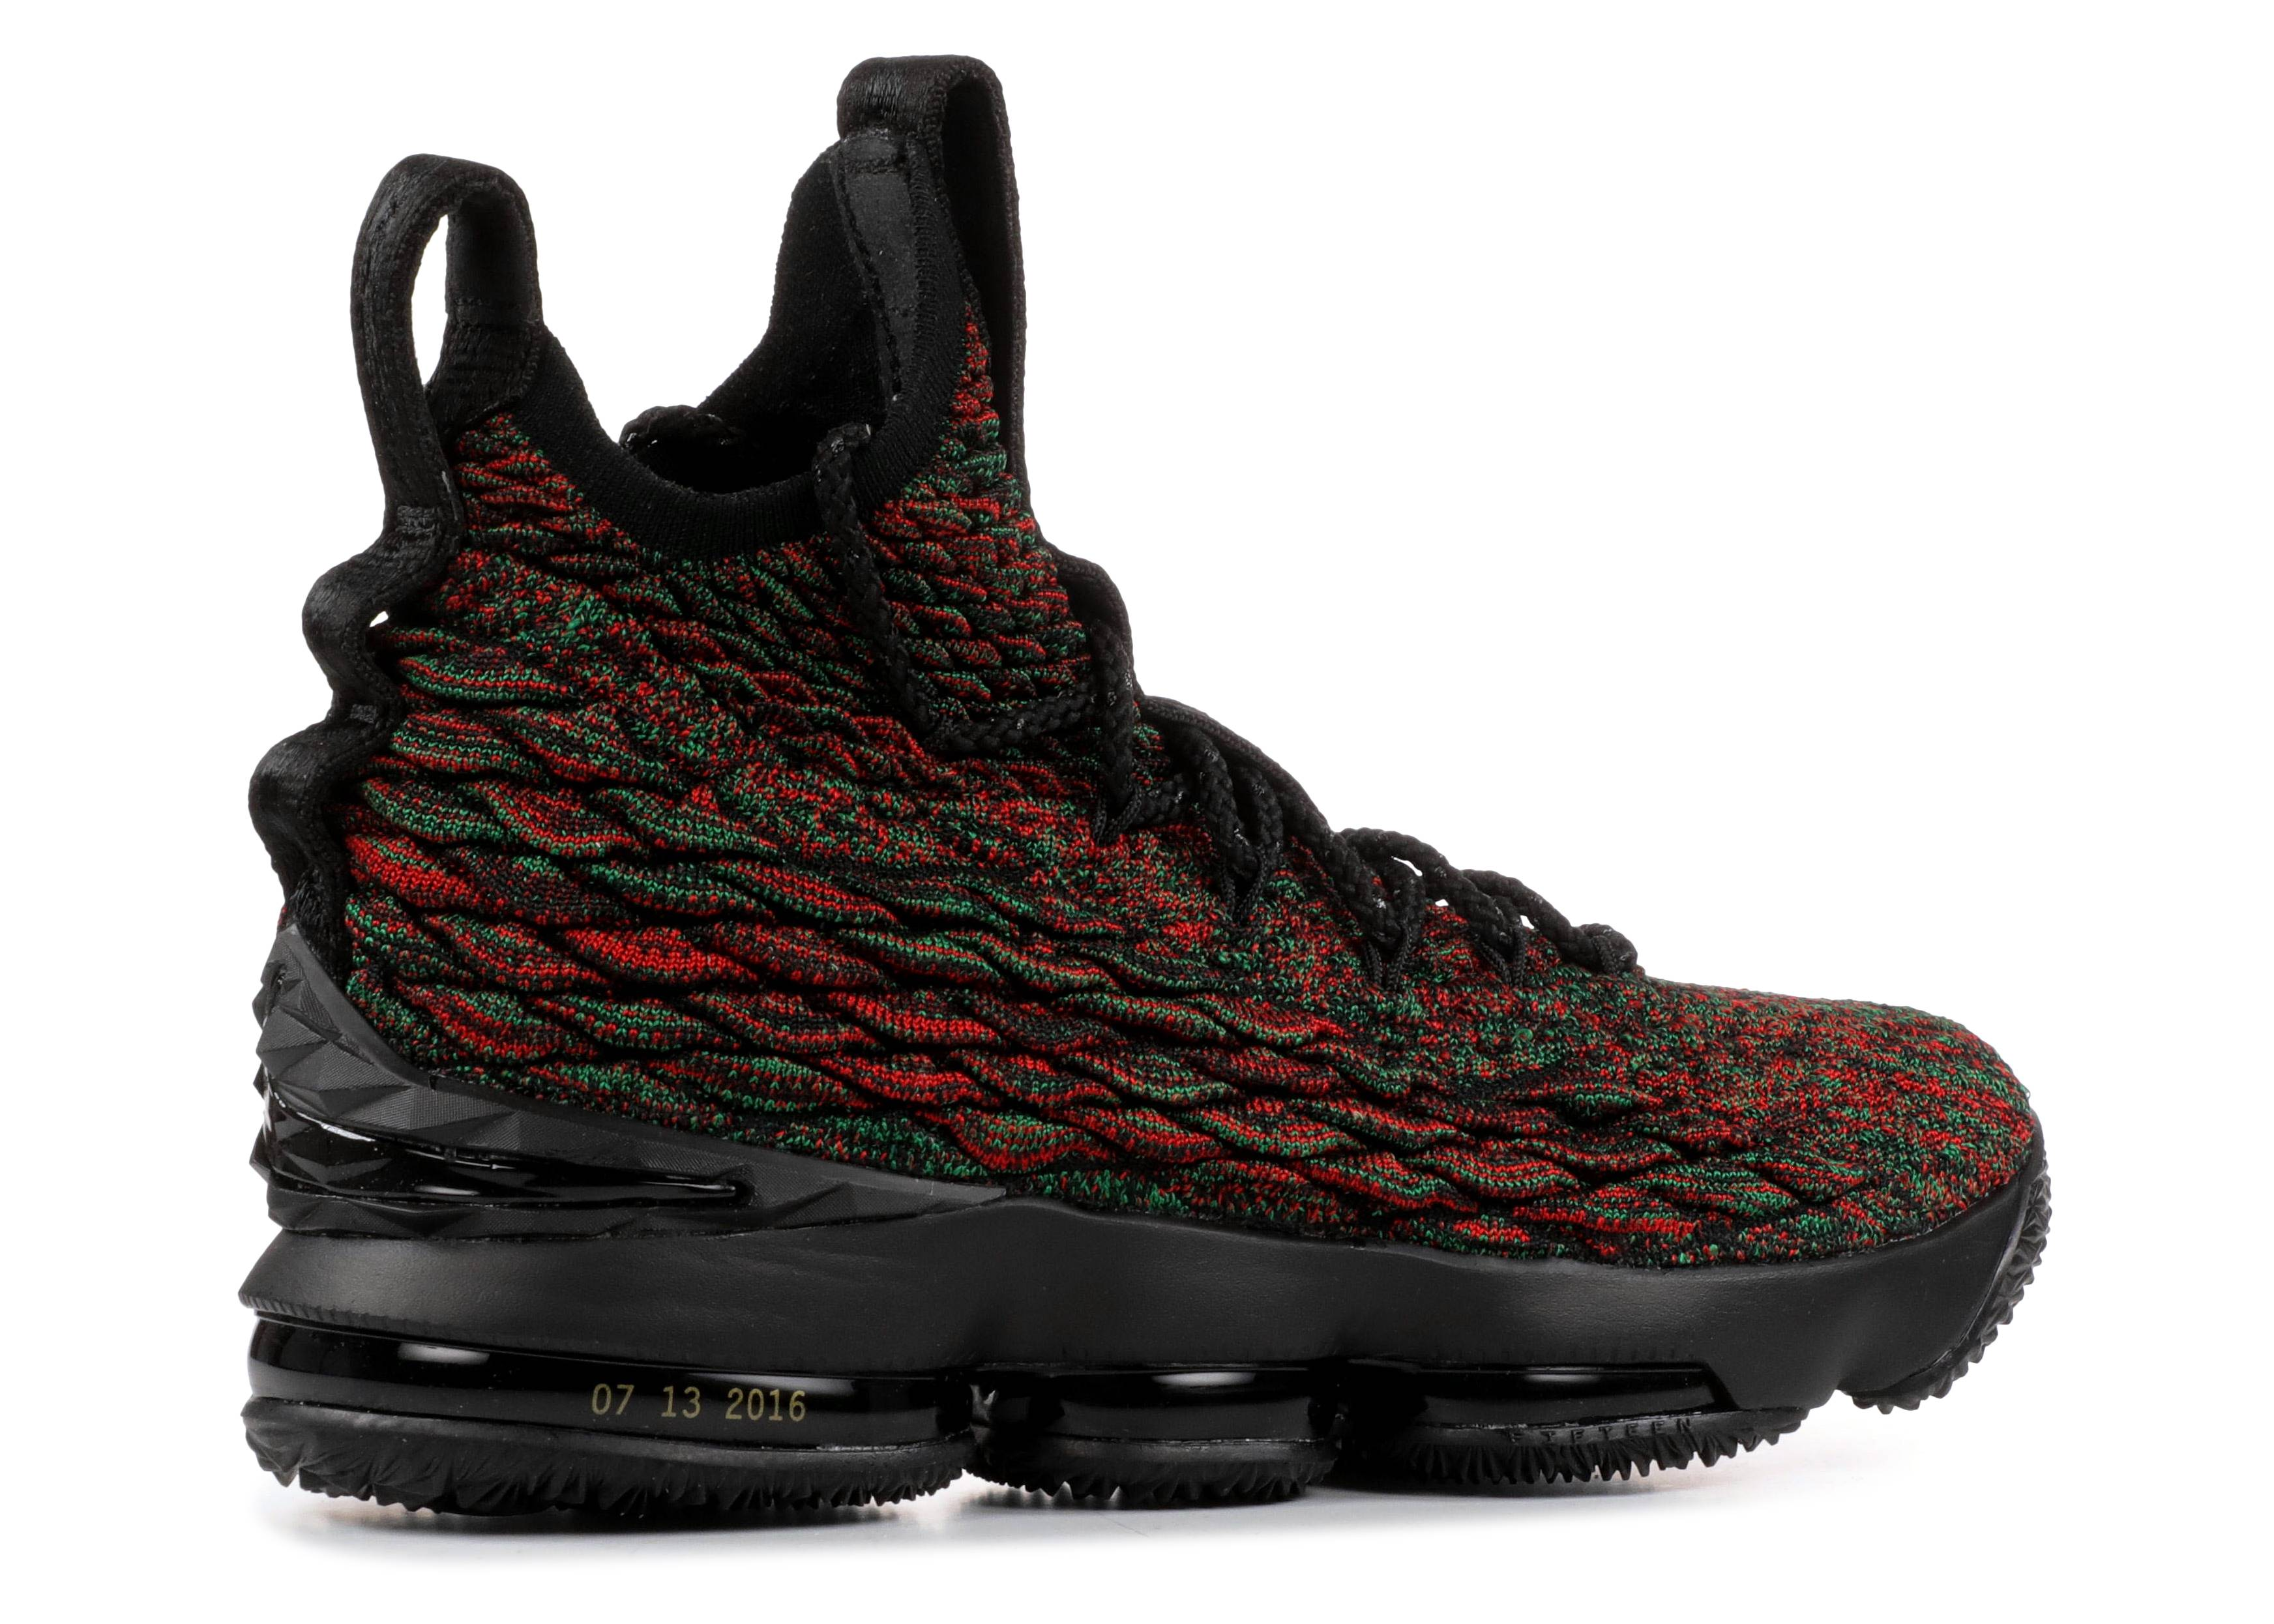 8eb440b4e31 Lebron 15 Lmtd - Nike - 897650 900 - multi-color black